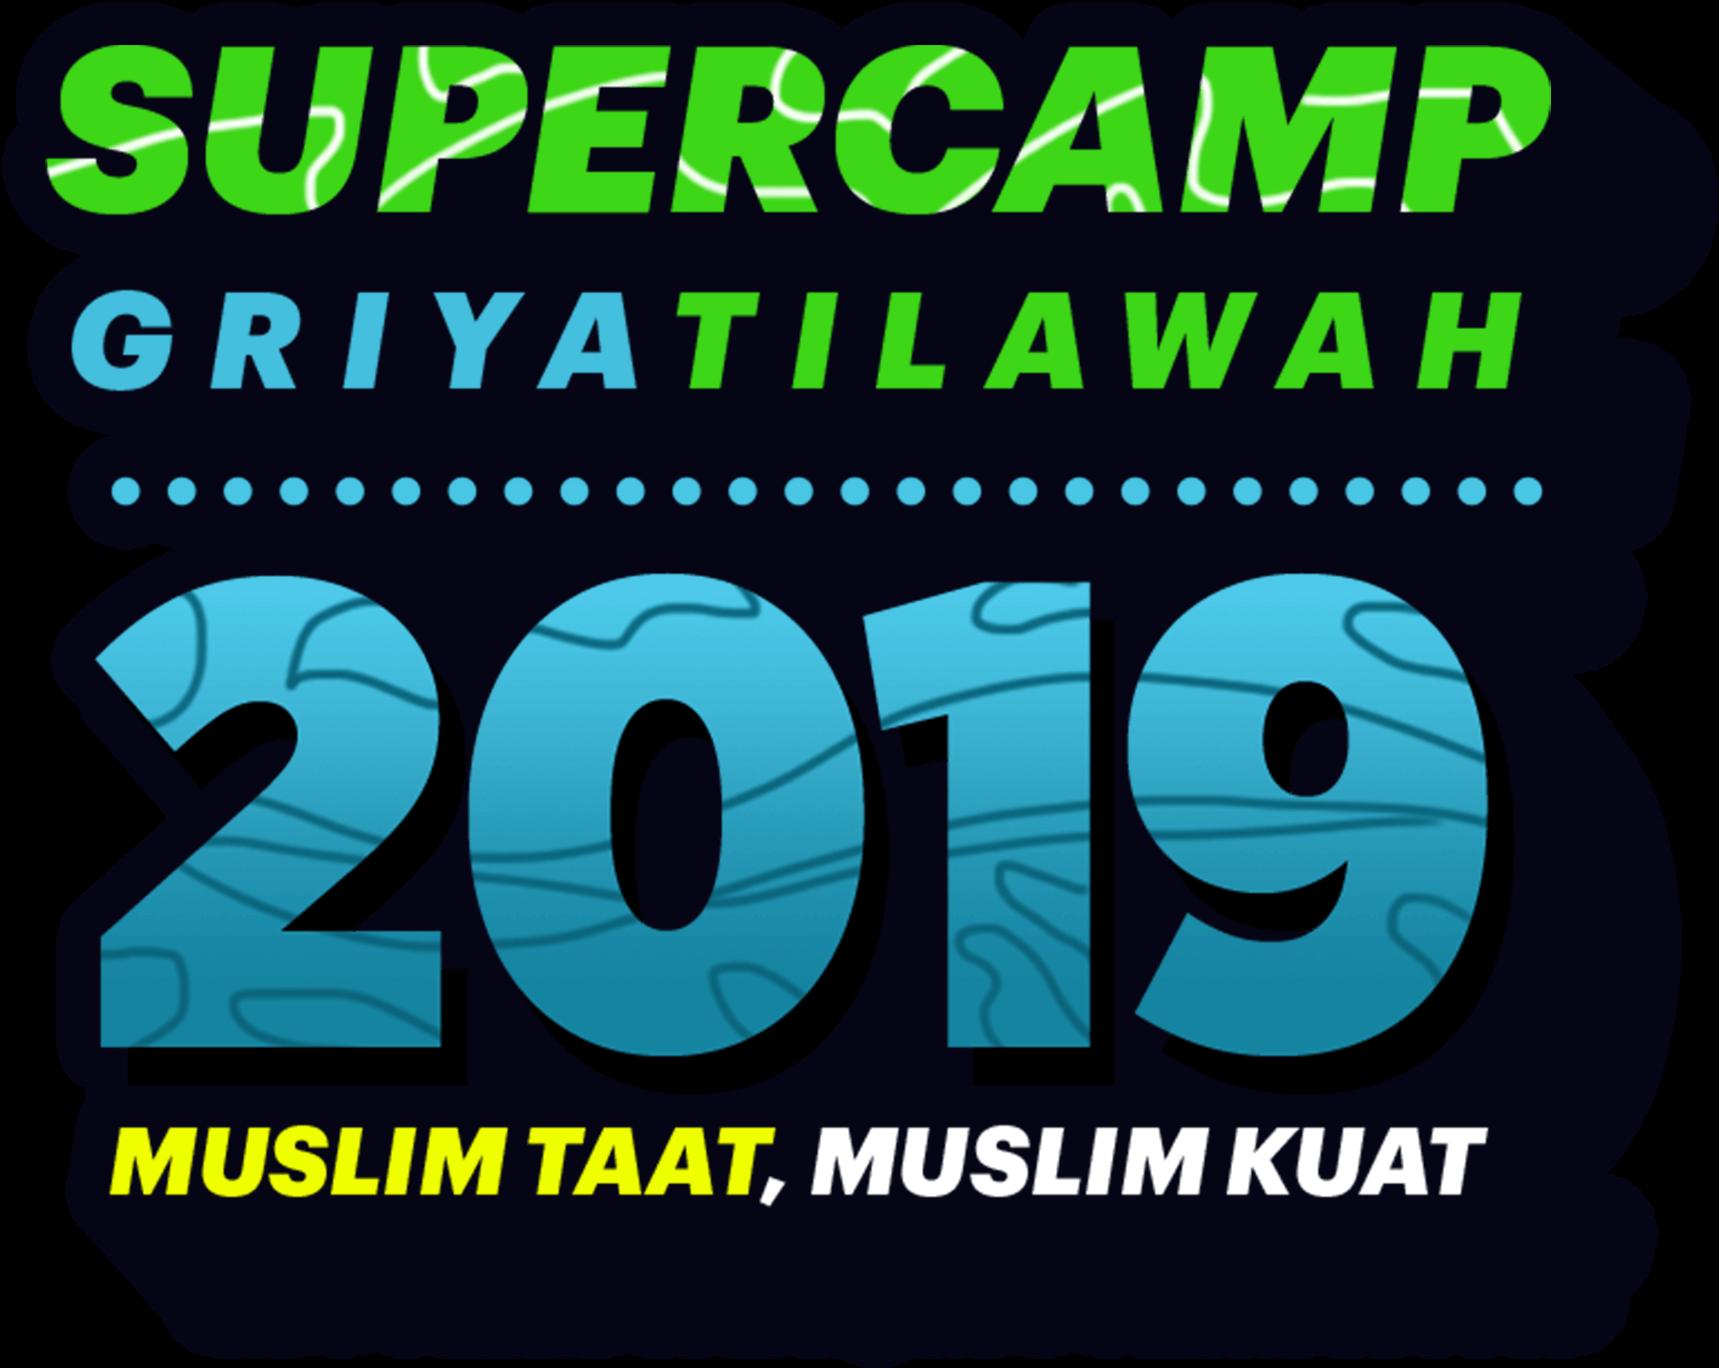 Supercamp 2019 griyatilawah